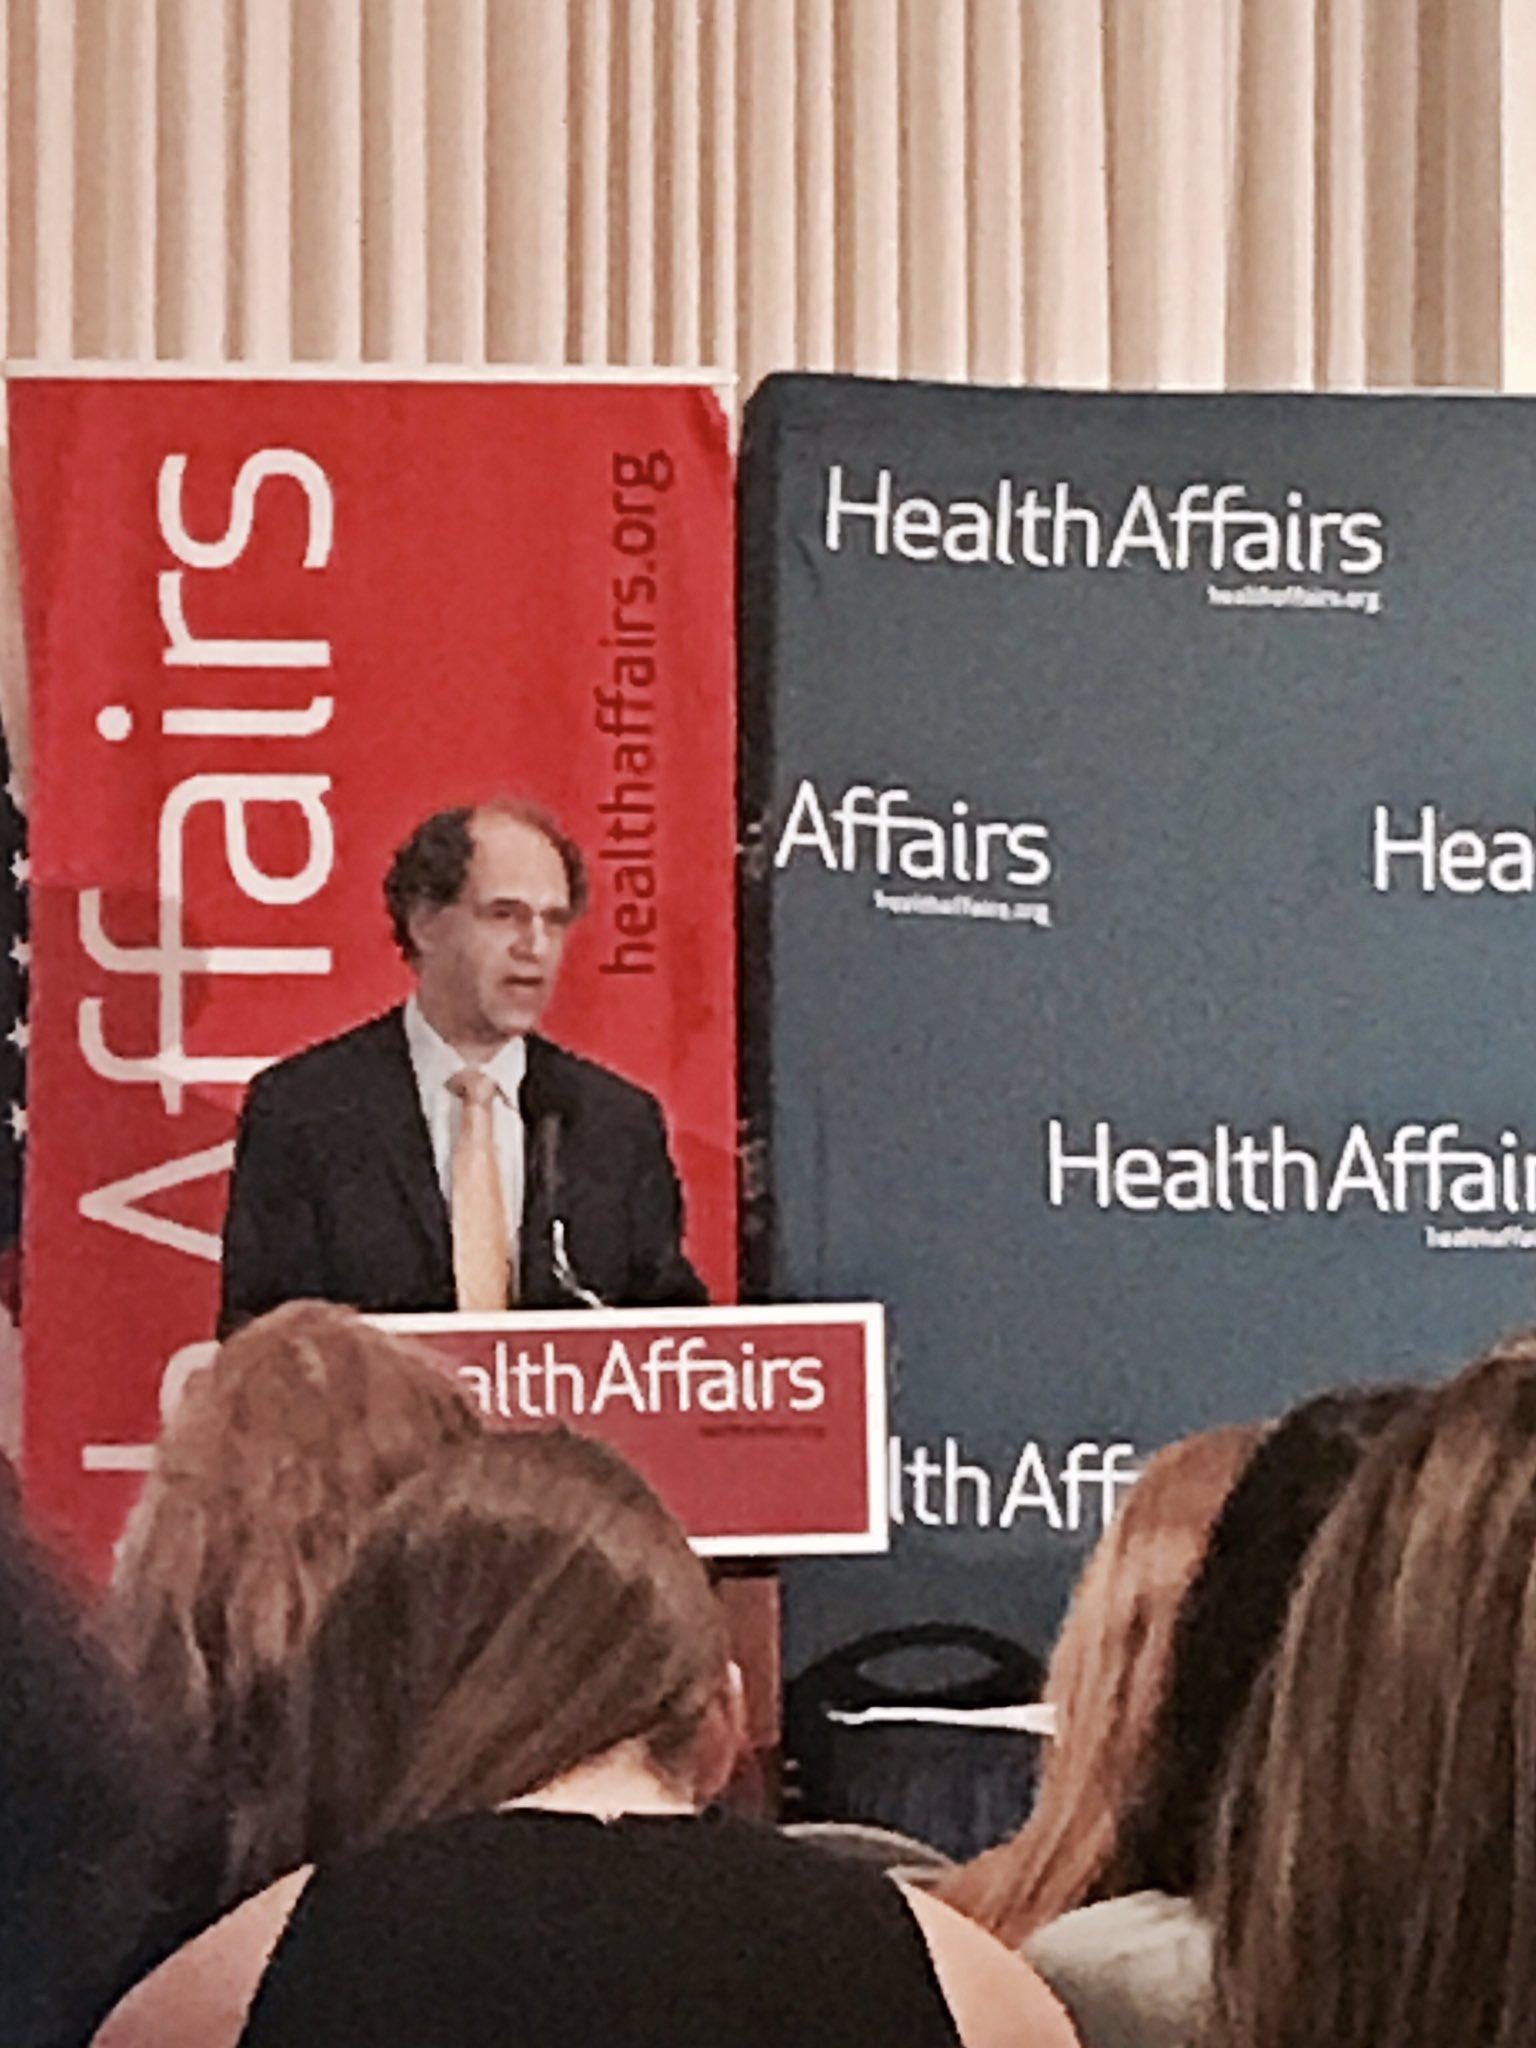 Health Affairs EIC @alanrweil kicks us off! #healthequity https://t.co/SKDyttCdCT